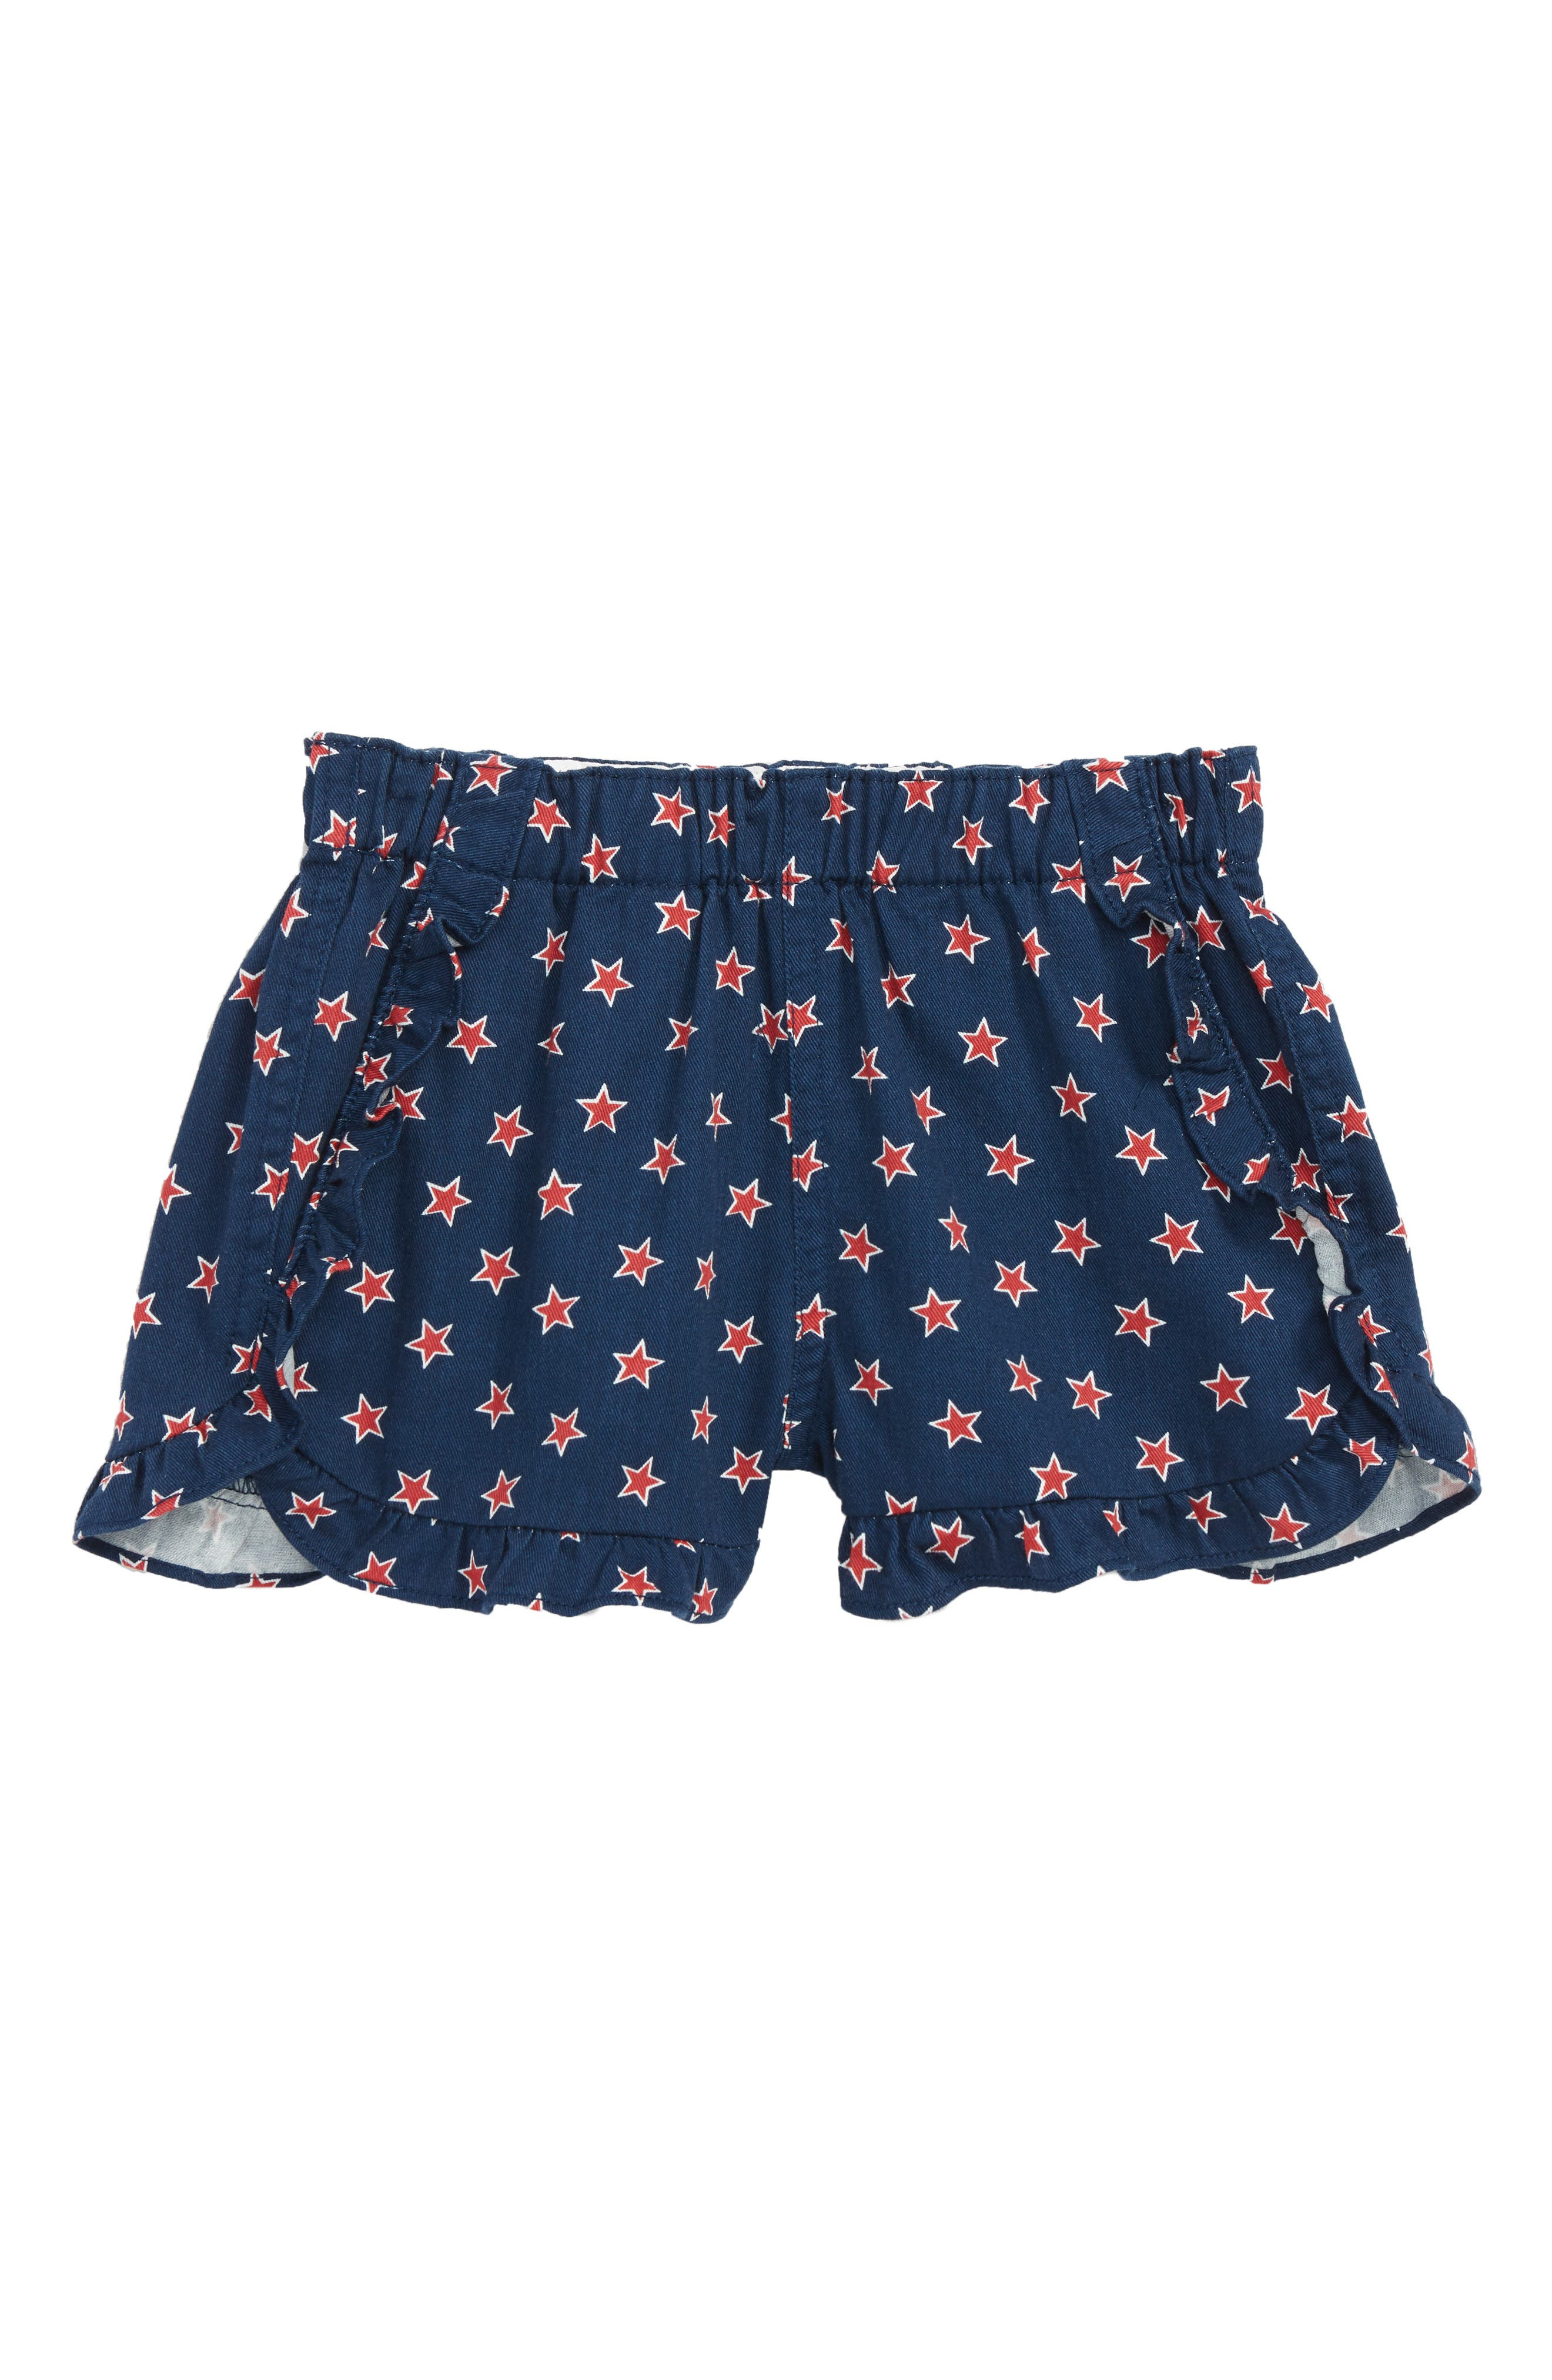 Star Print Ruffle Pull-On Shorts,                             Main thumbnail 1, color,                             Dark Indigo